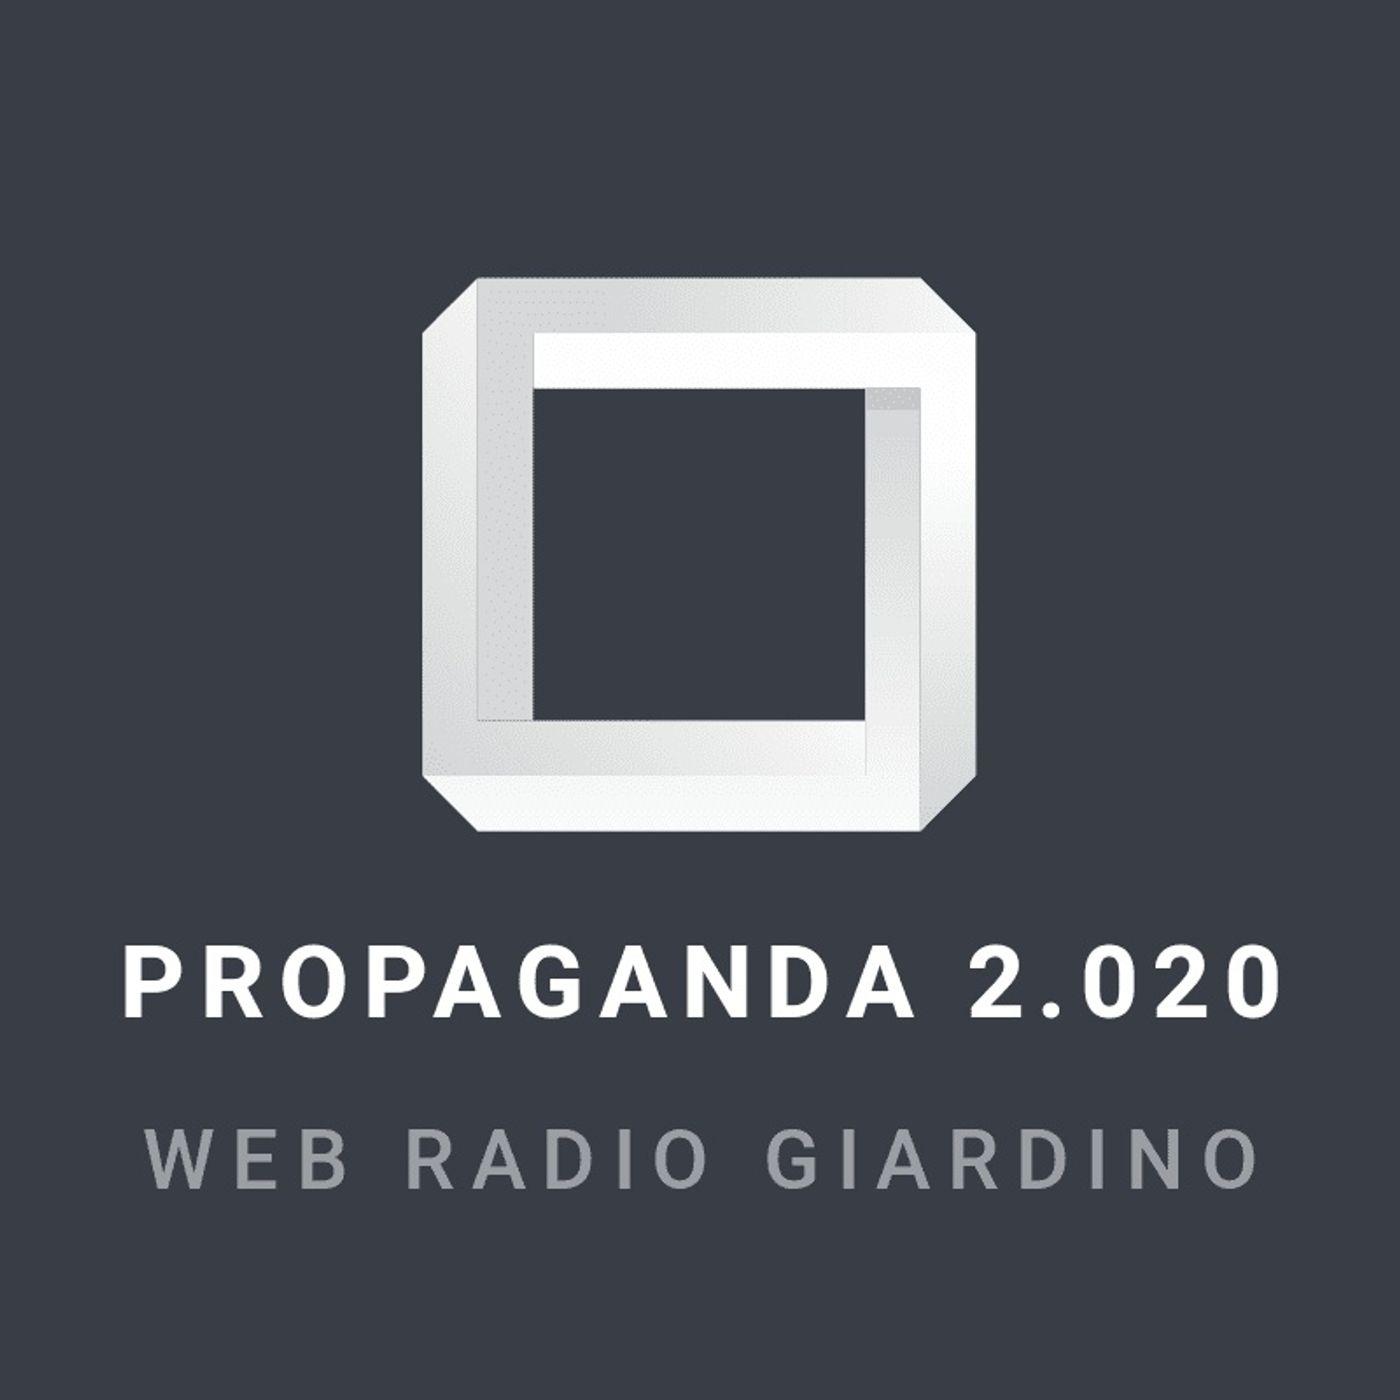 Intervista a Luca Maria Baldini + novità da Caribou, Moon Duo, Thom Yorke, Tinariwen - Propaganda - s03e05